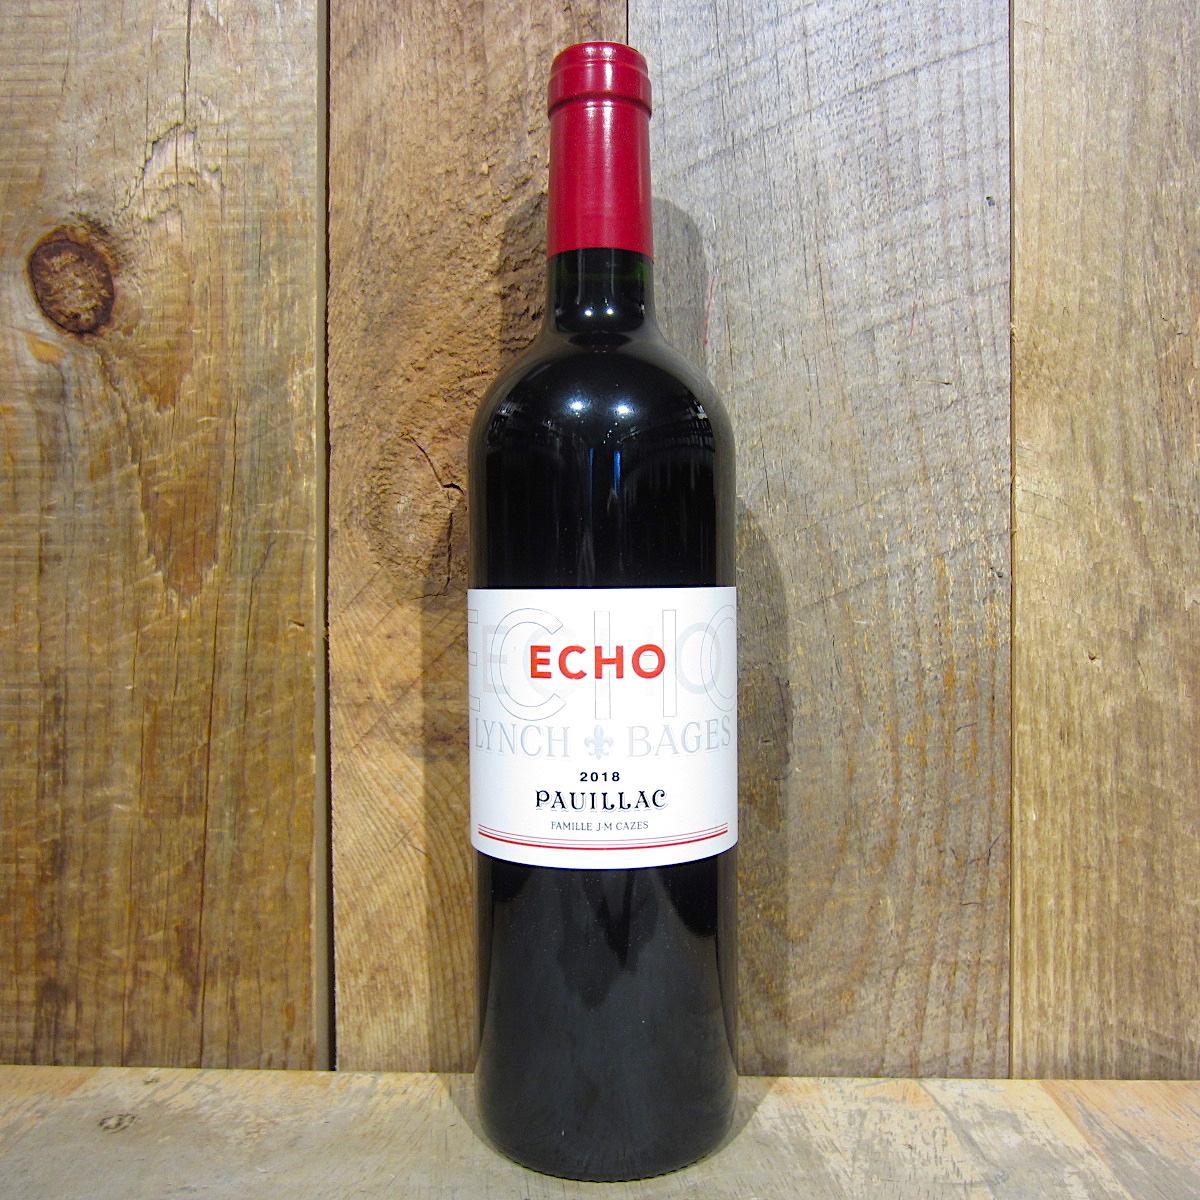 Echo de Lynch Bages Pauillac 2018 750ml